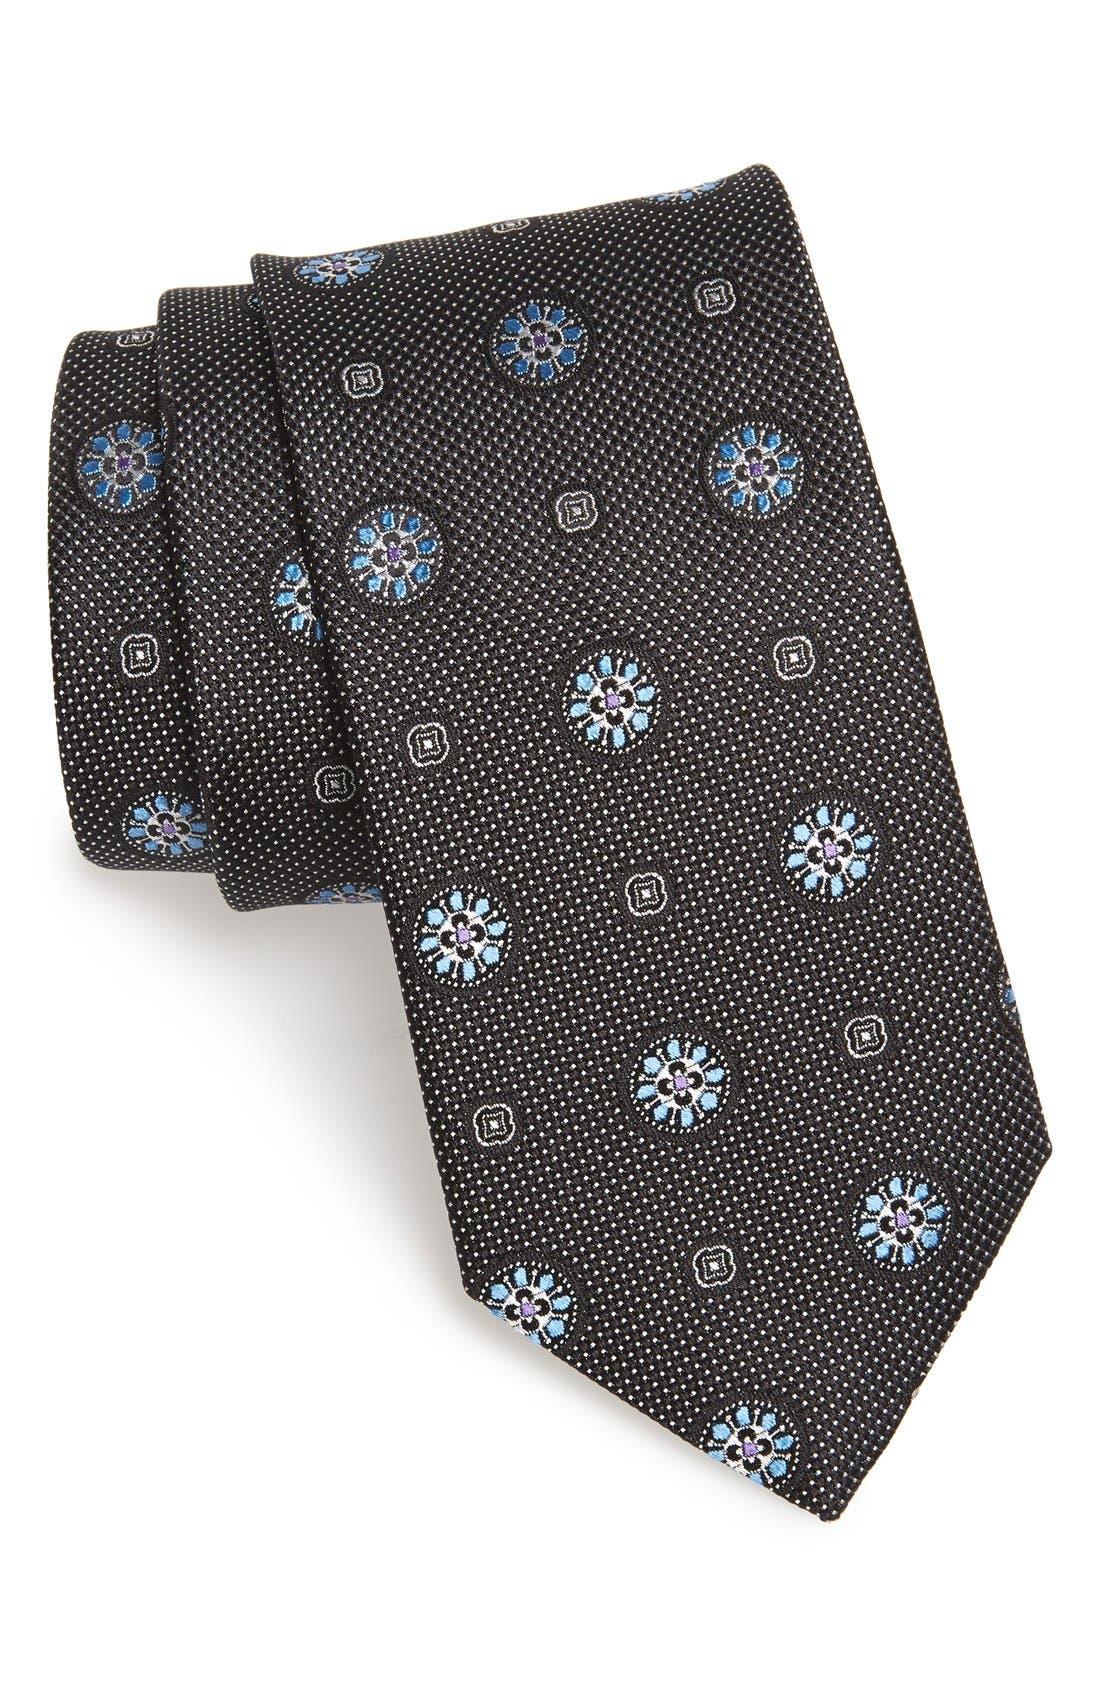 Medallion Silk Tie,                             Main thumbnail 1, color,                             001